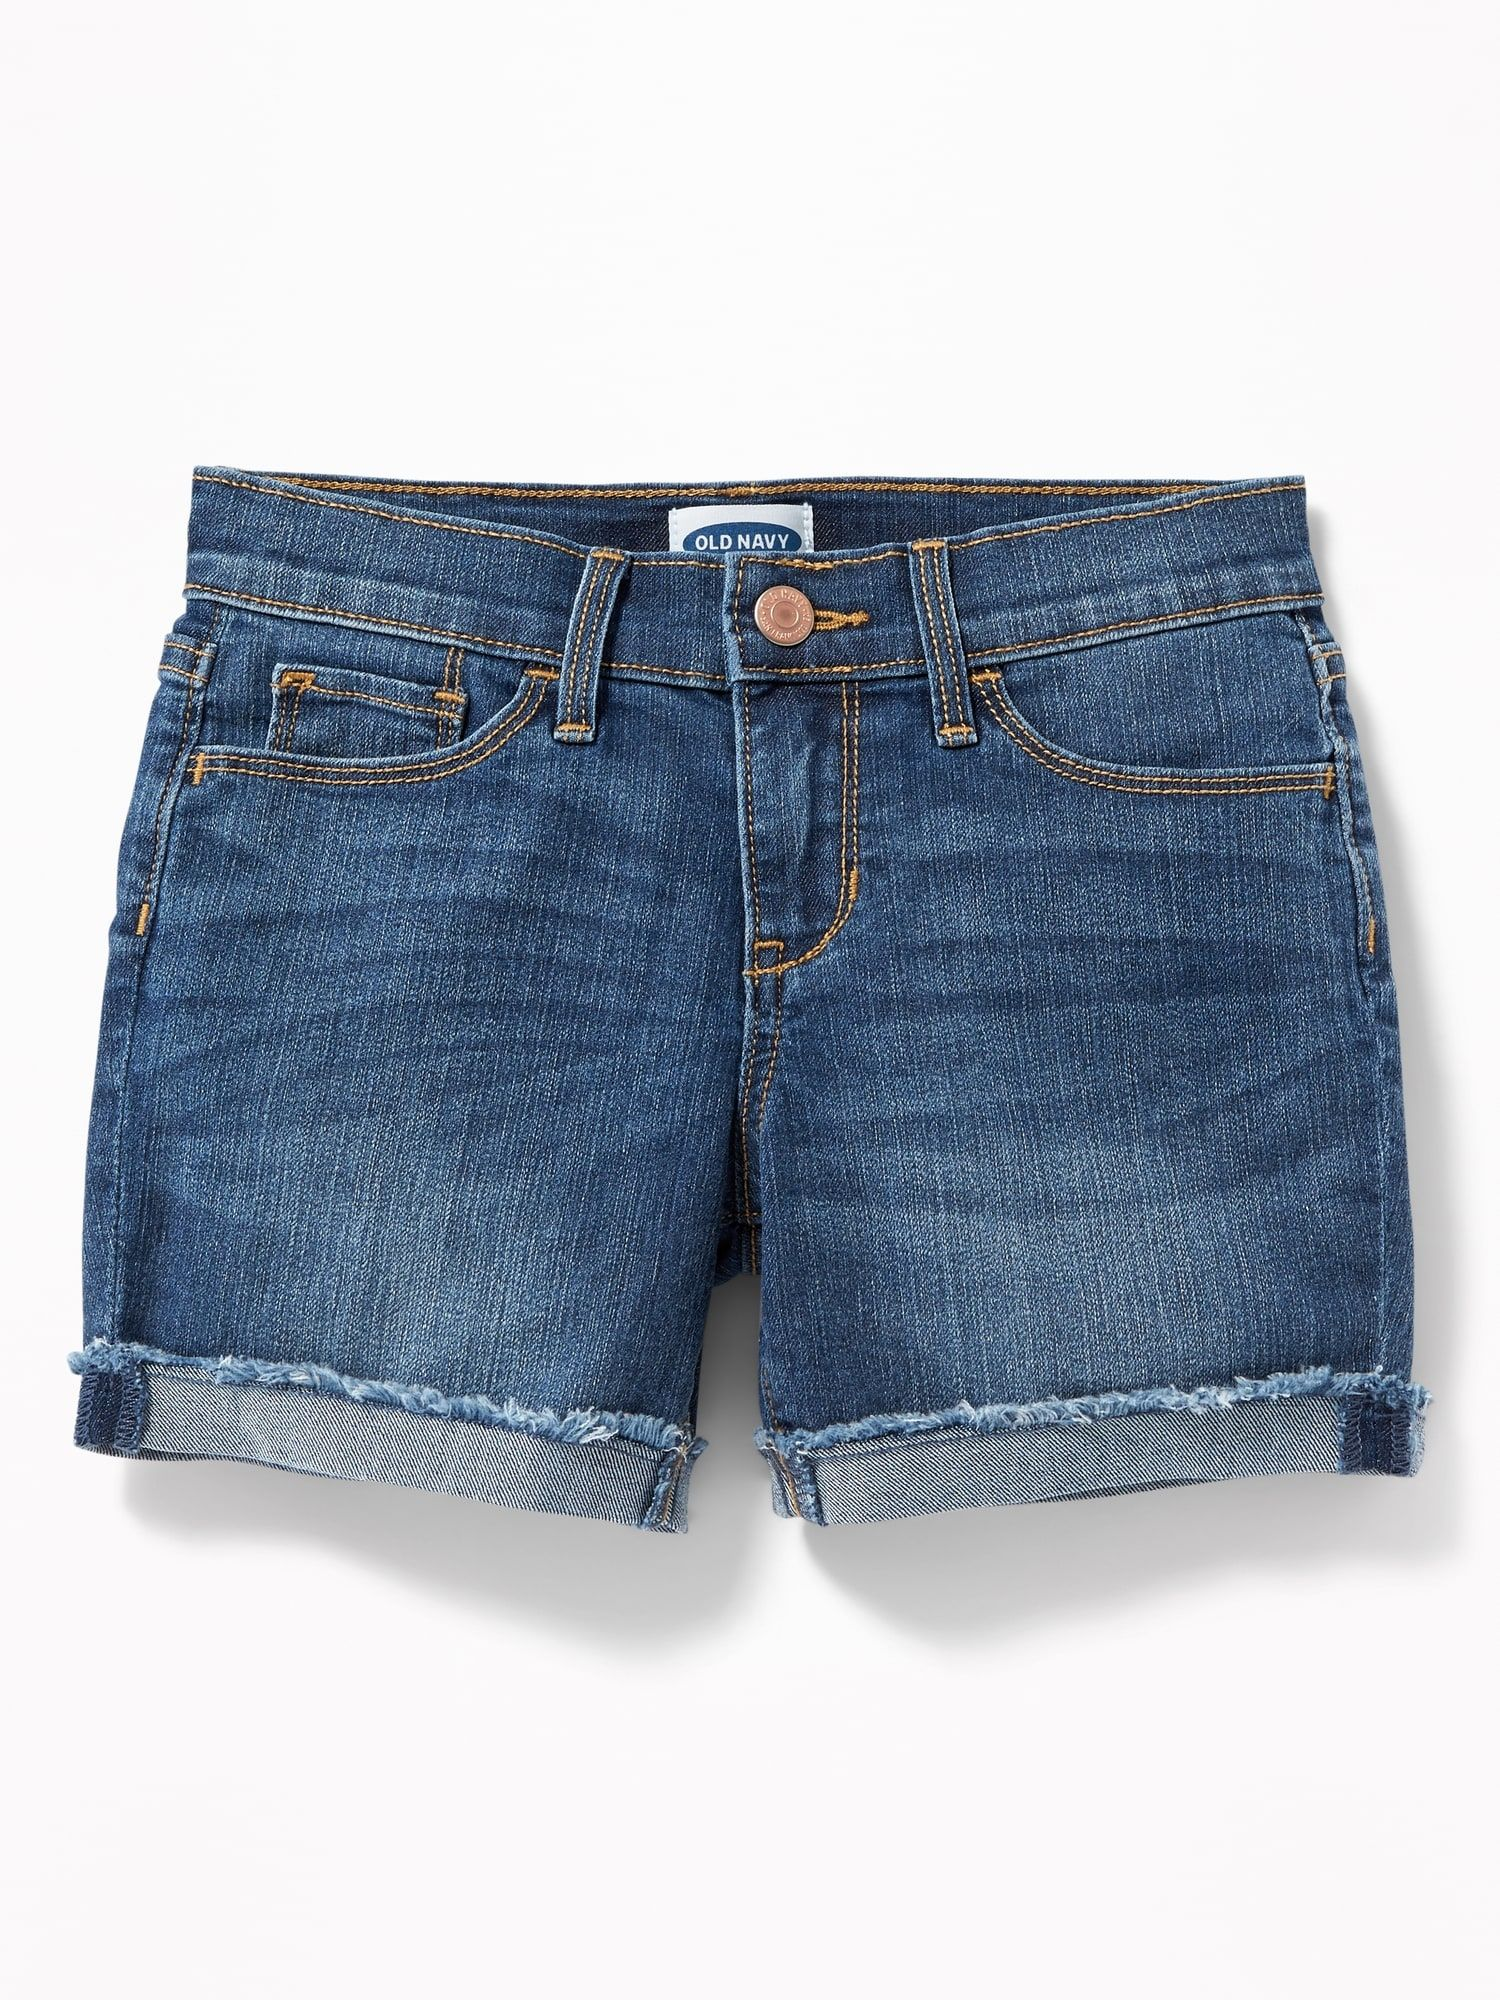 Rolled Fray Hem Denim Shorts for Girls | Frayed hem jeans